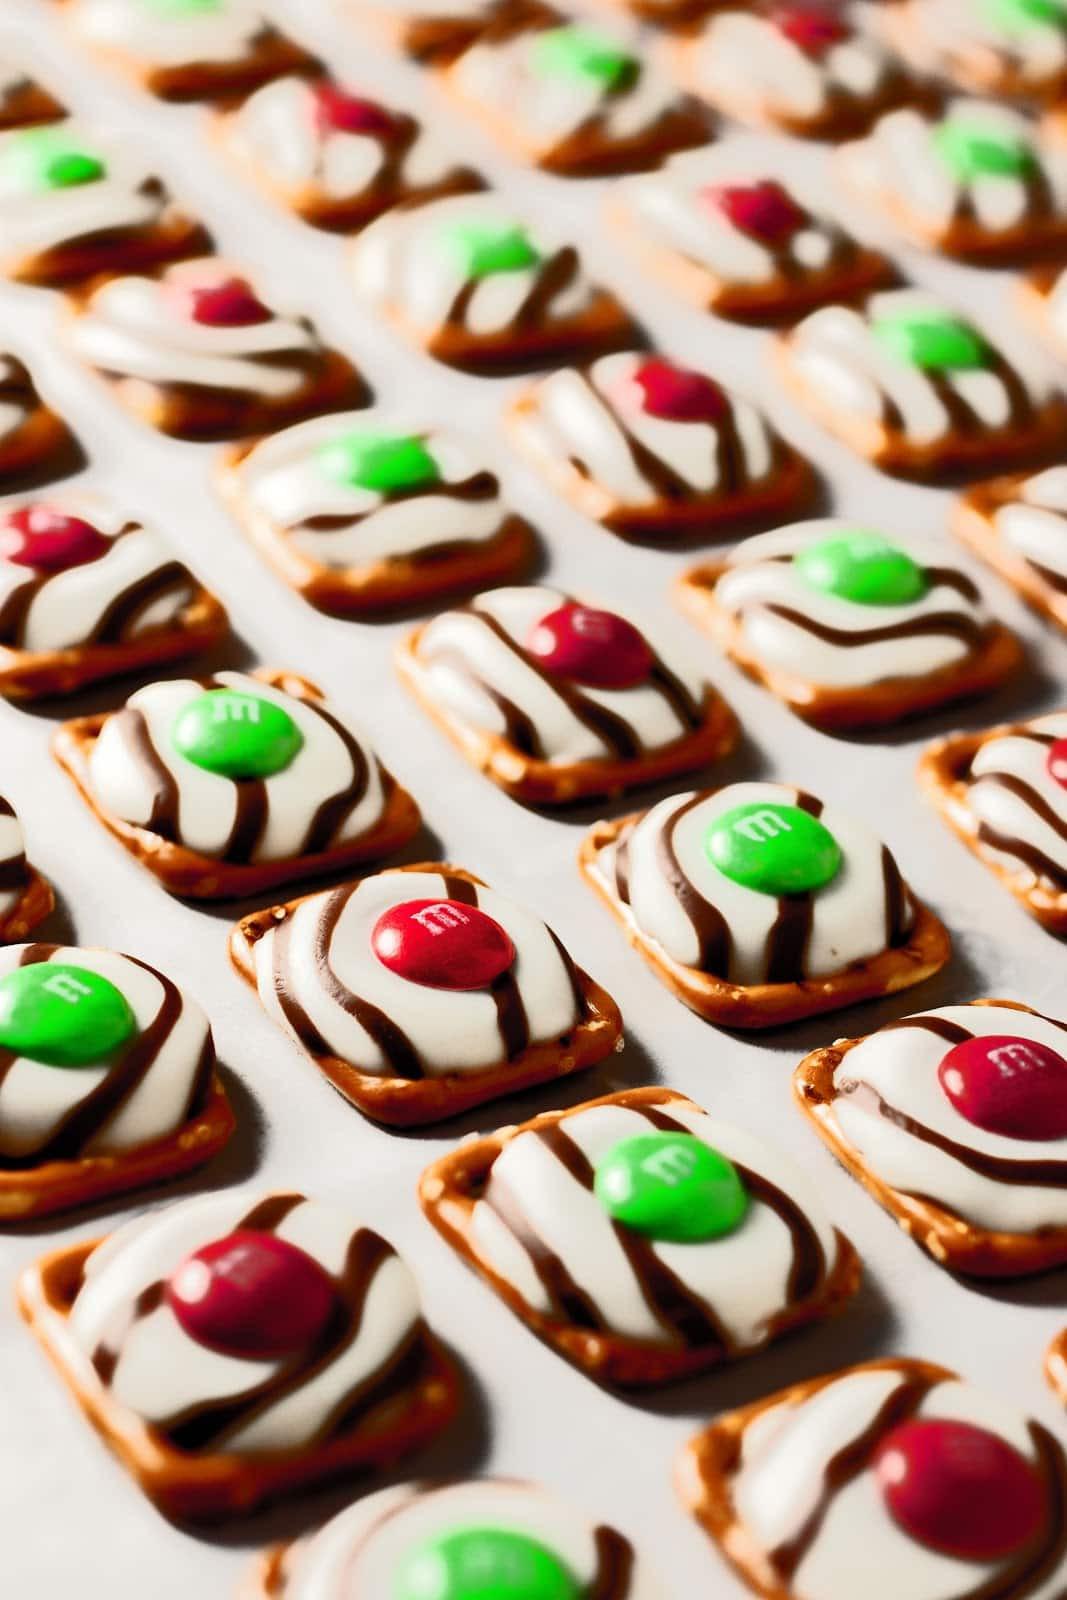 Christmas Pretzels Recipes  Pretzel M&M Hugs Christmas Style Cooking Classy